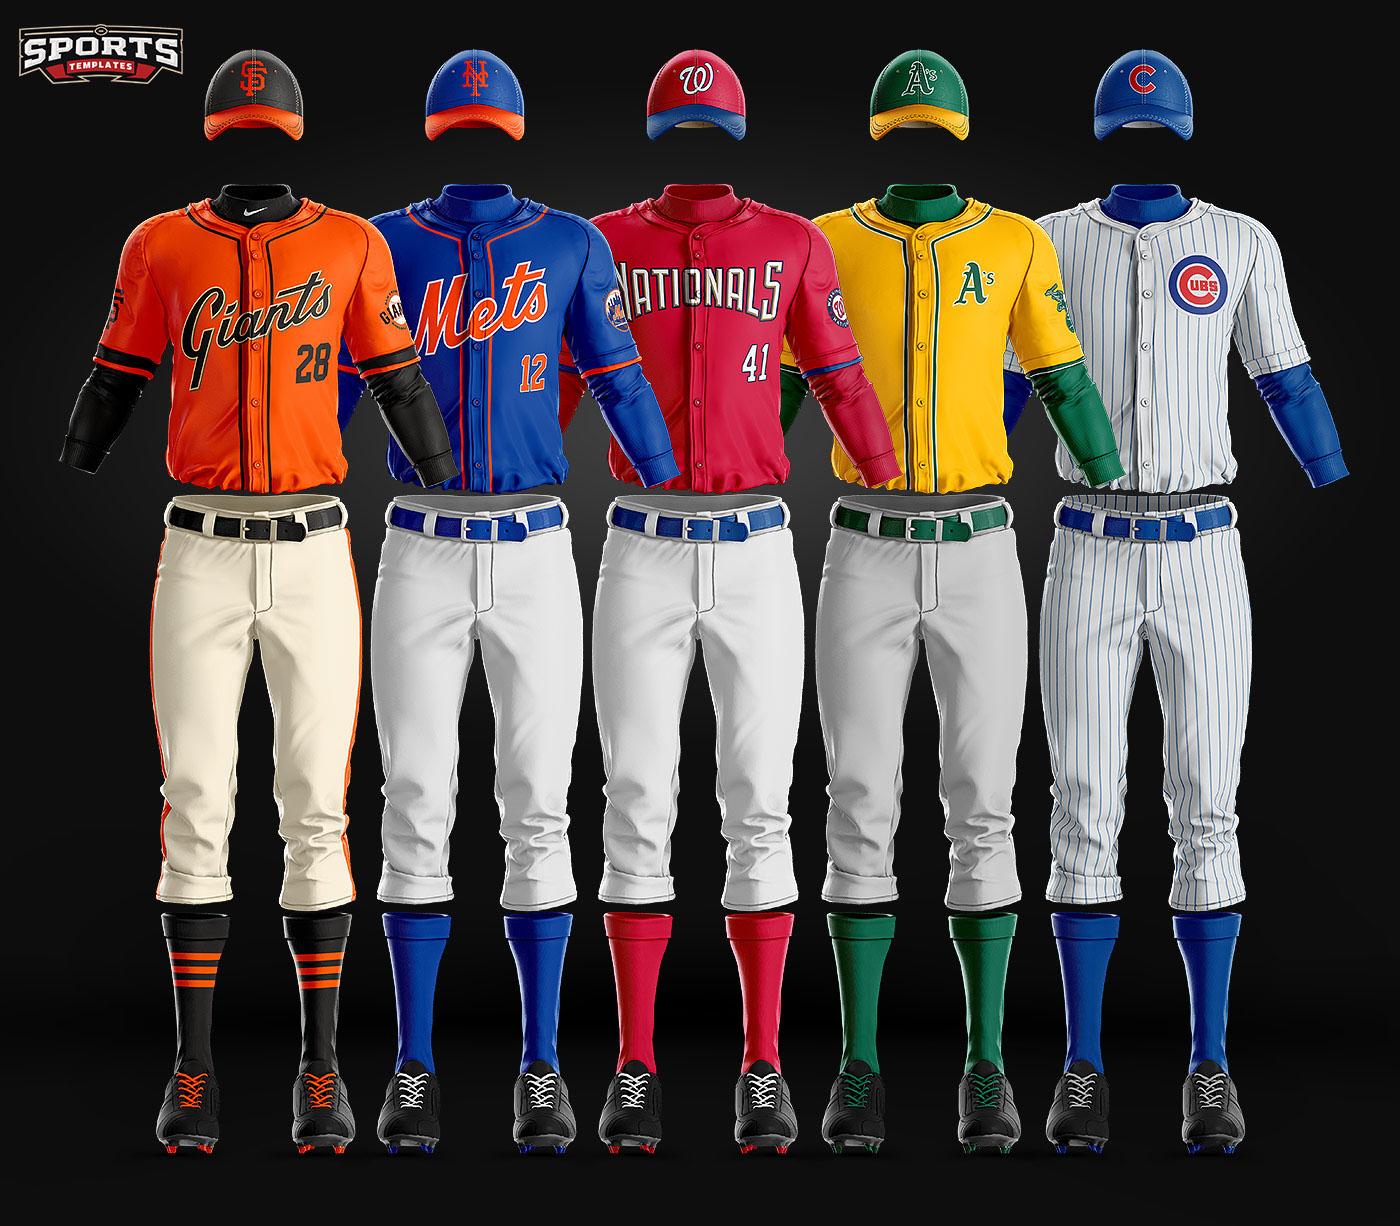 design mlb sf giants baseball jersey and uniform photoshop tutorial template